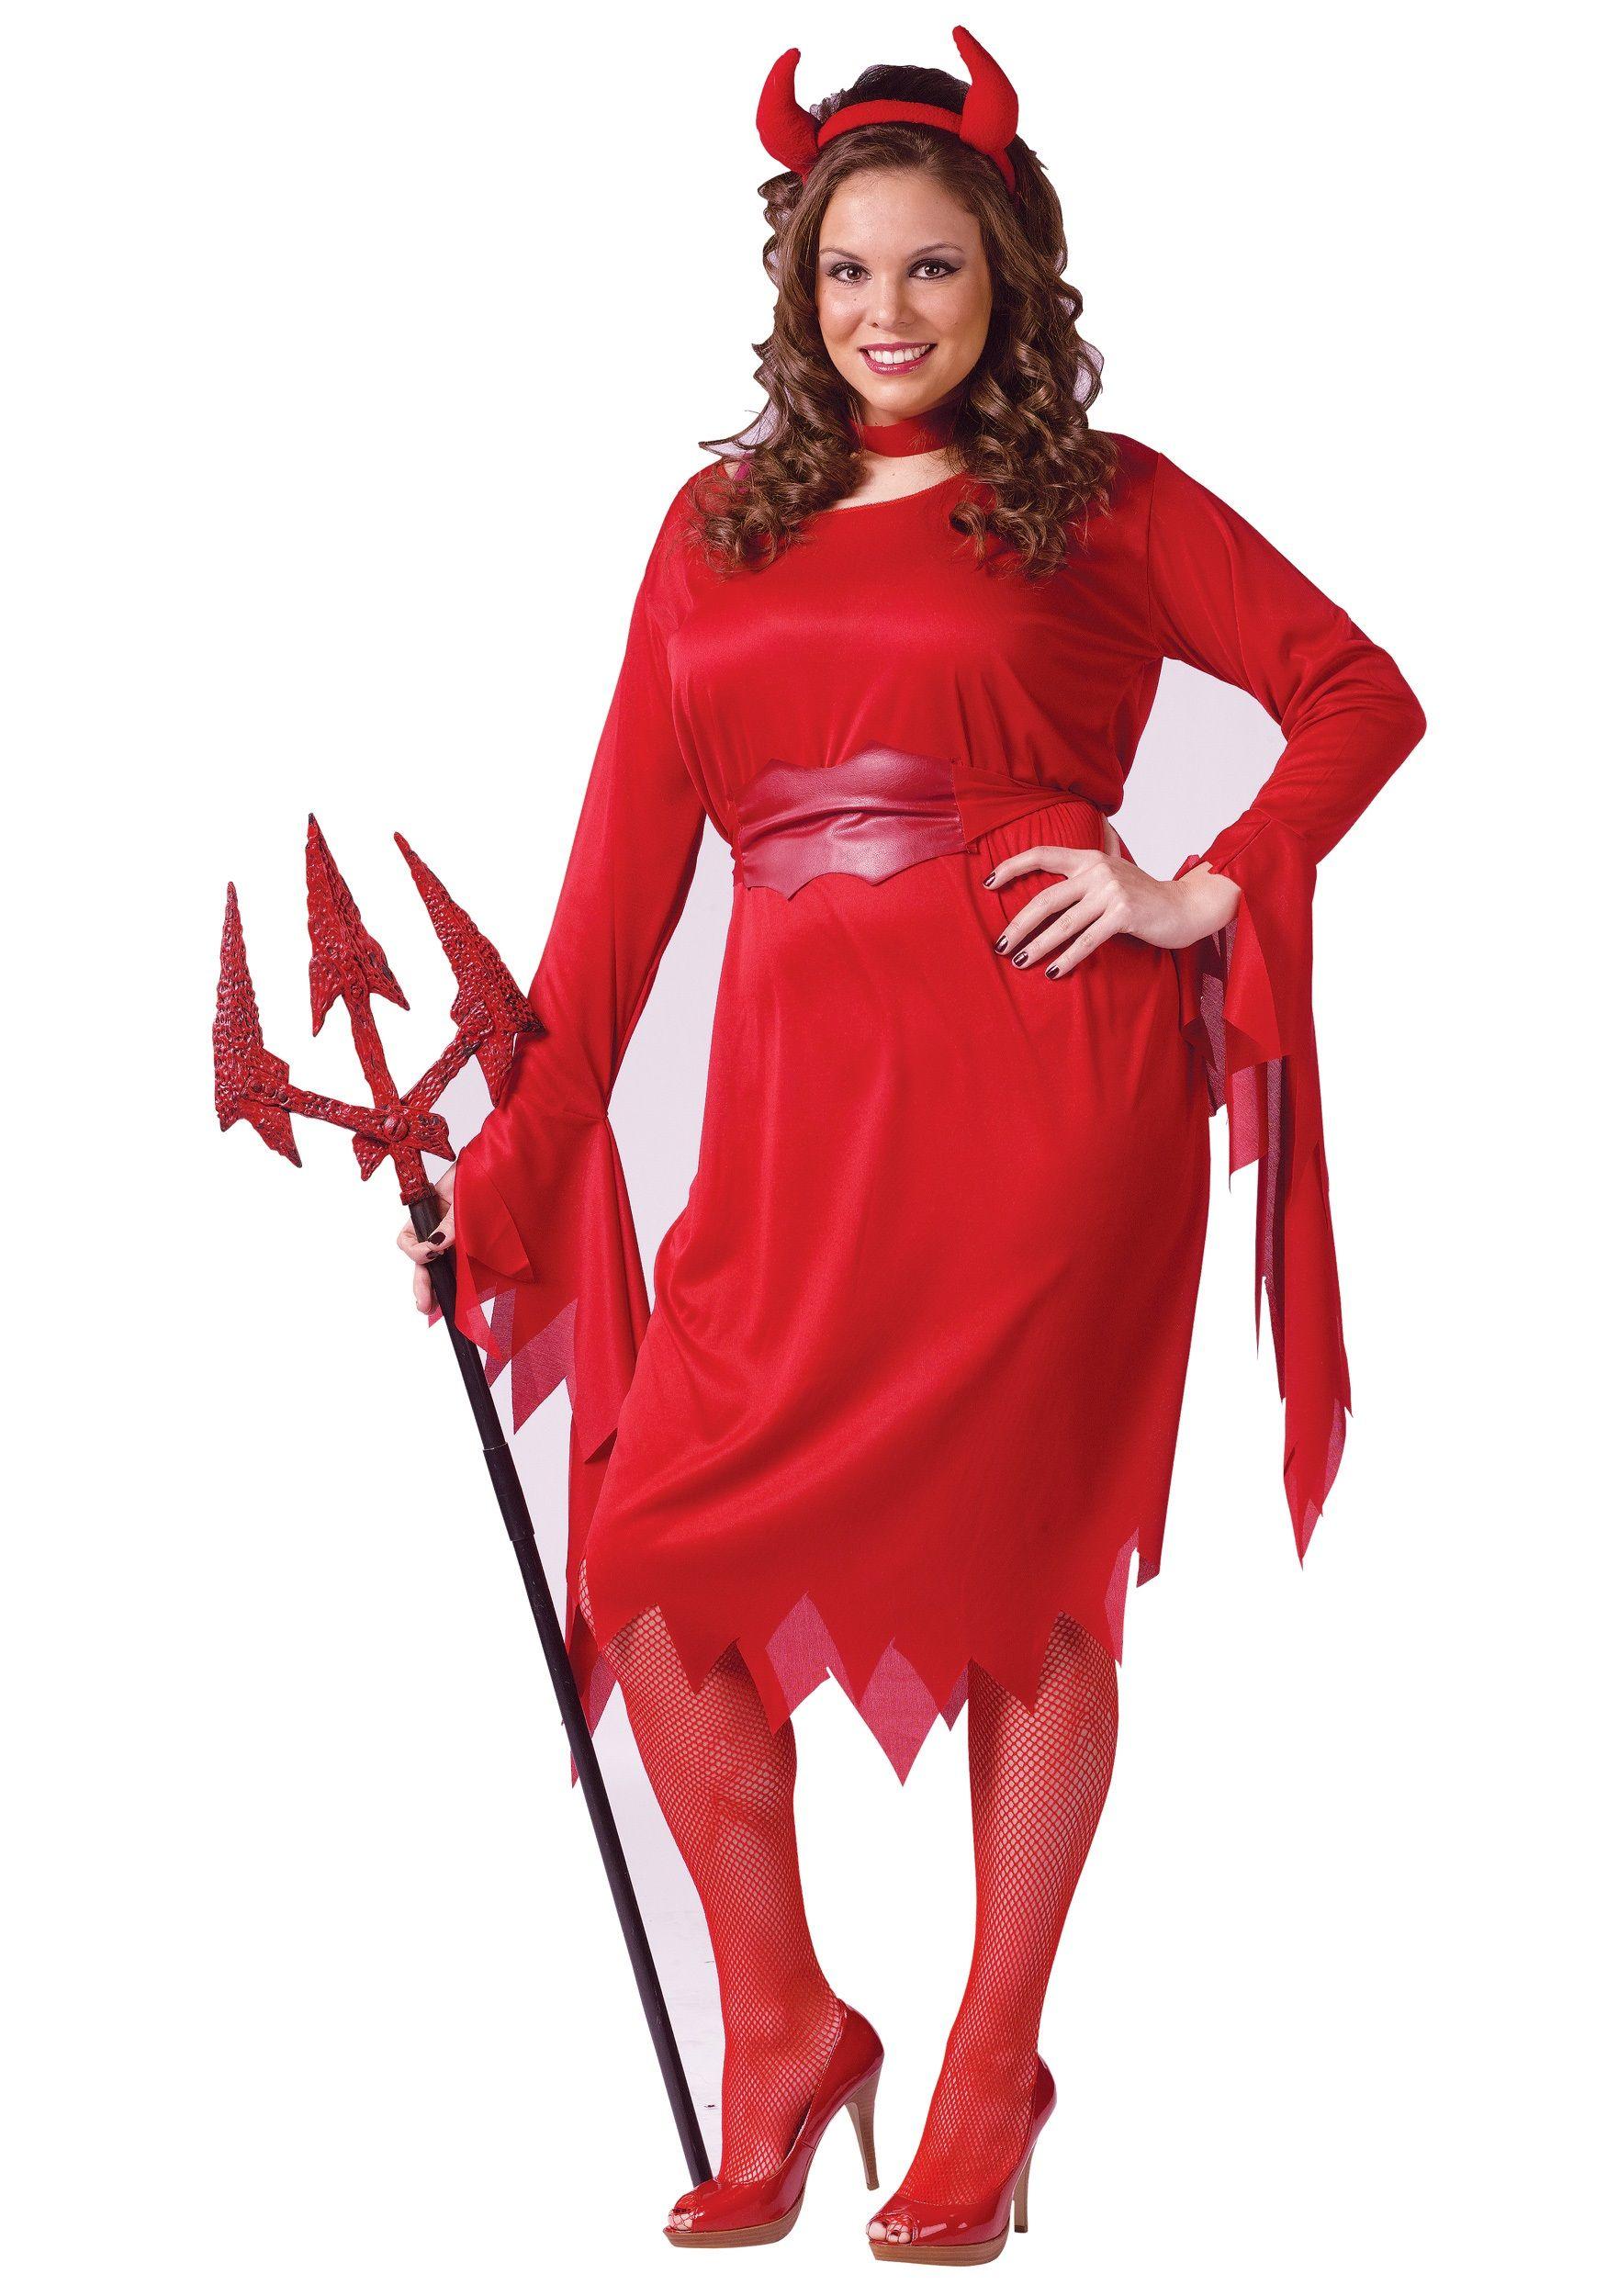 Animal Halloween Costume Ideas For Teens, HAppy Animal Halloween ...